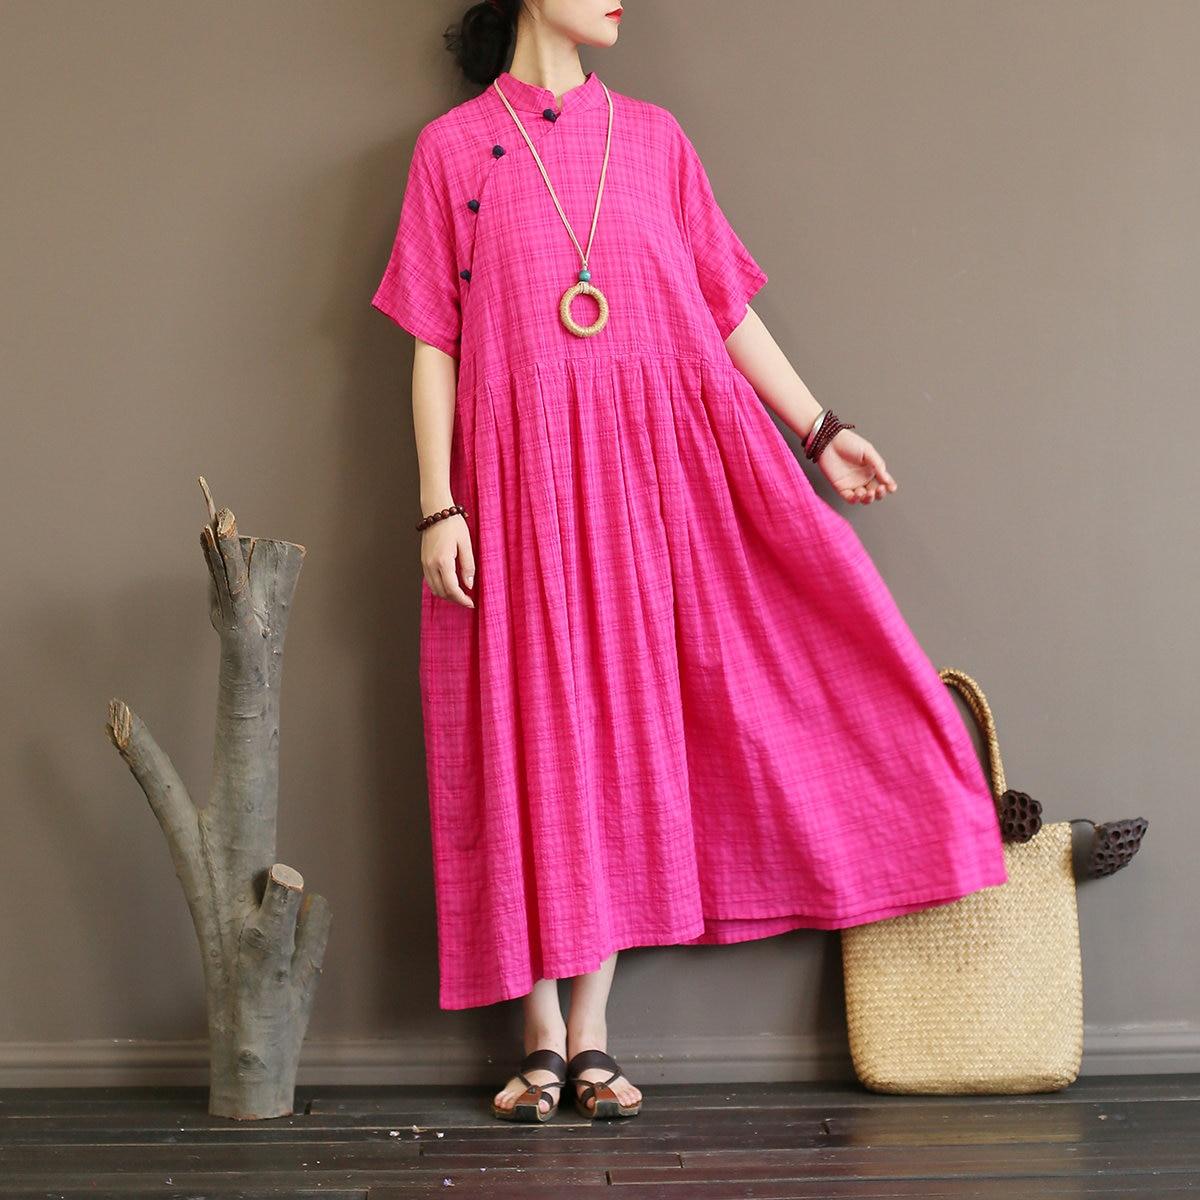 Women National Vintage Style Long Dresses Stand Collar Plate Buckle Summer High Waist Half Sleeve Loose Dresses 3